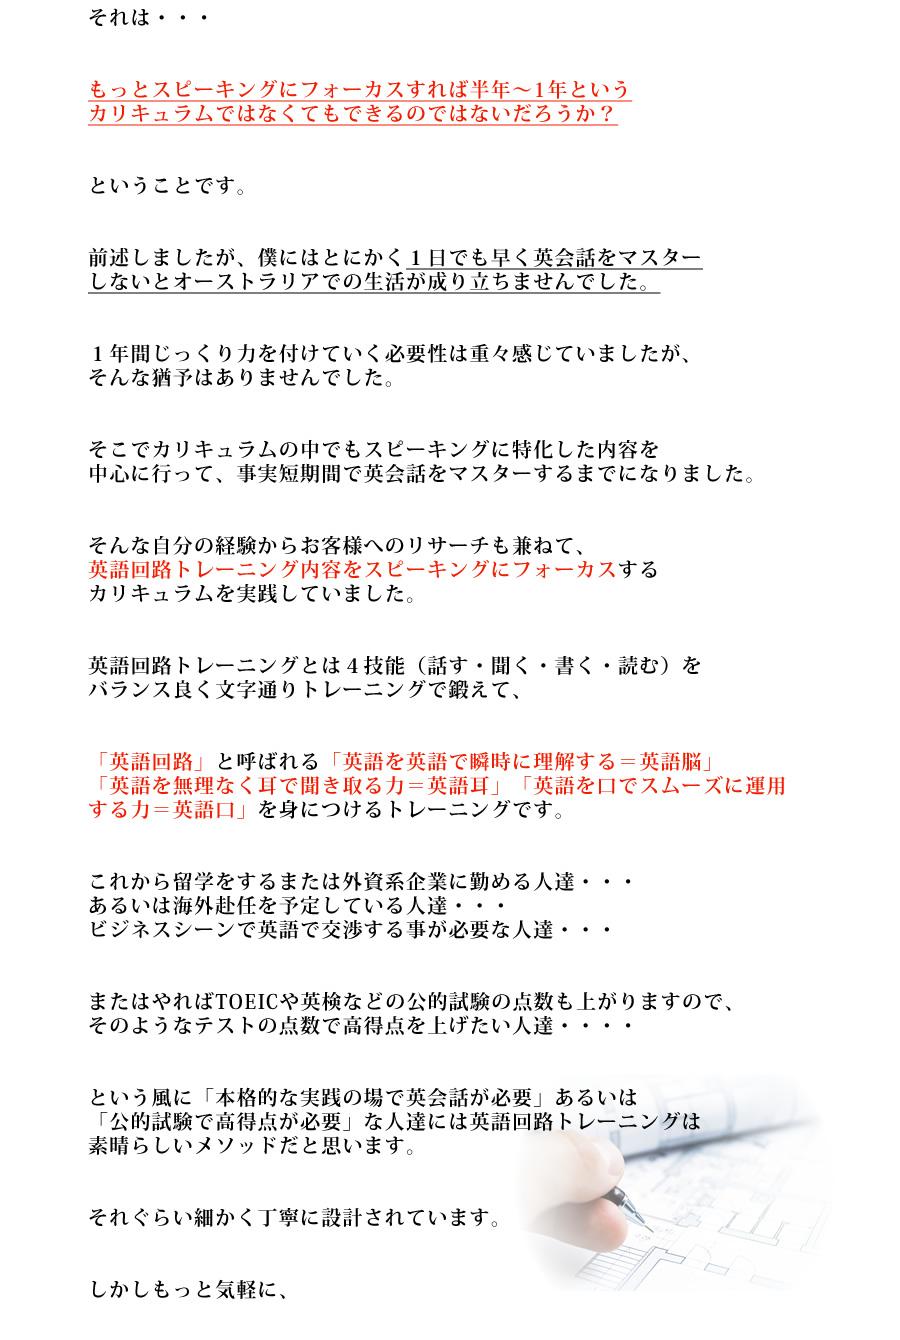 fs-message-5